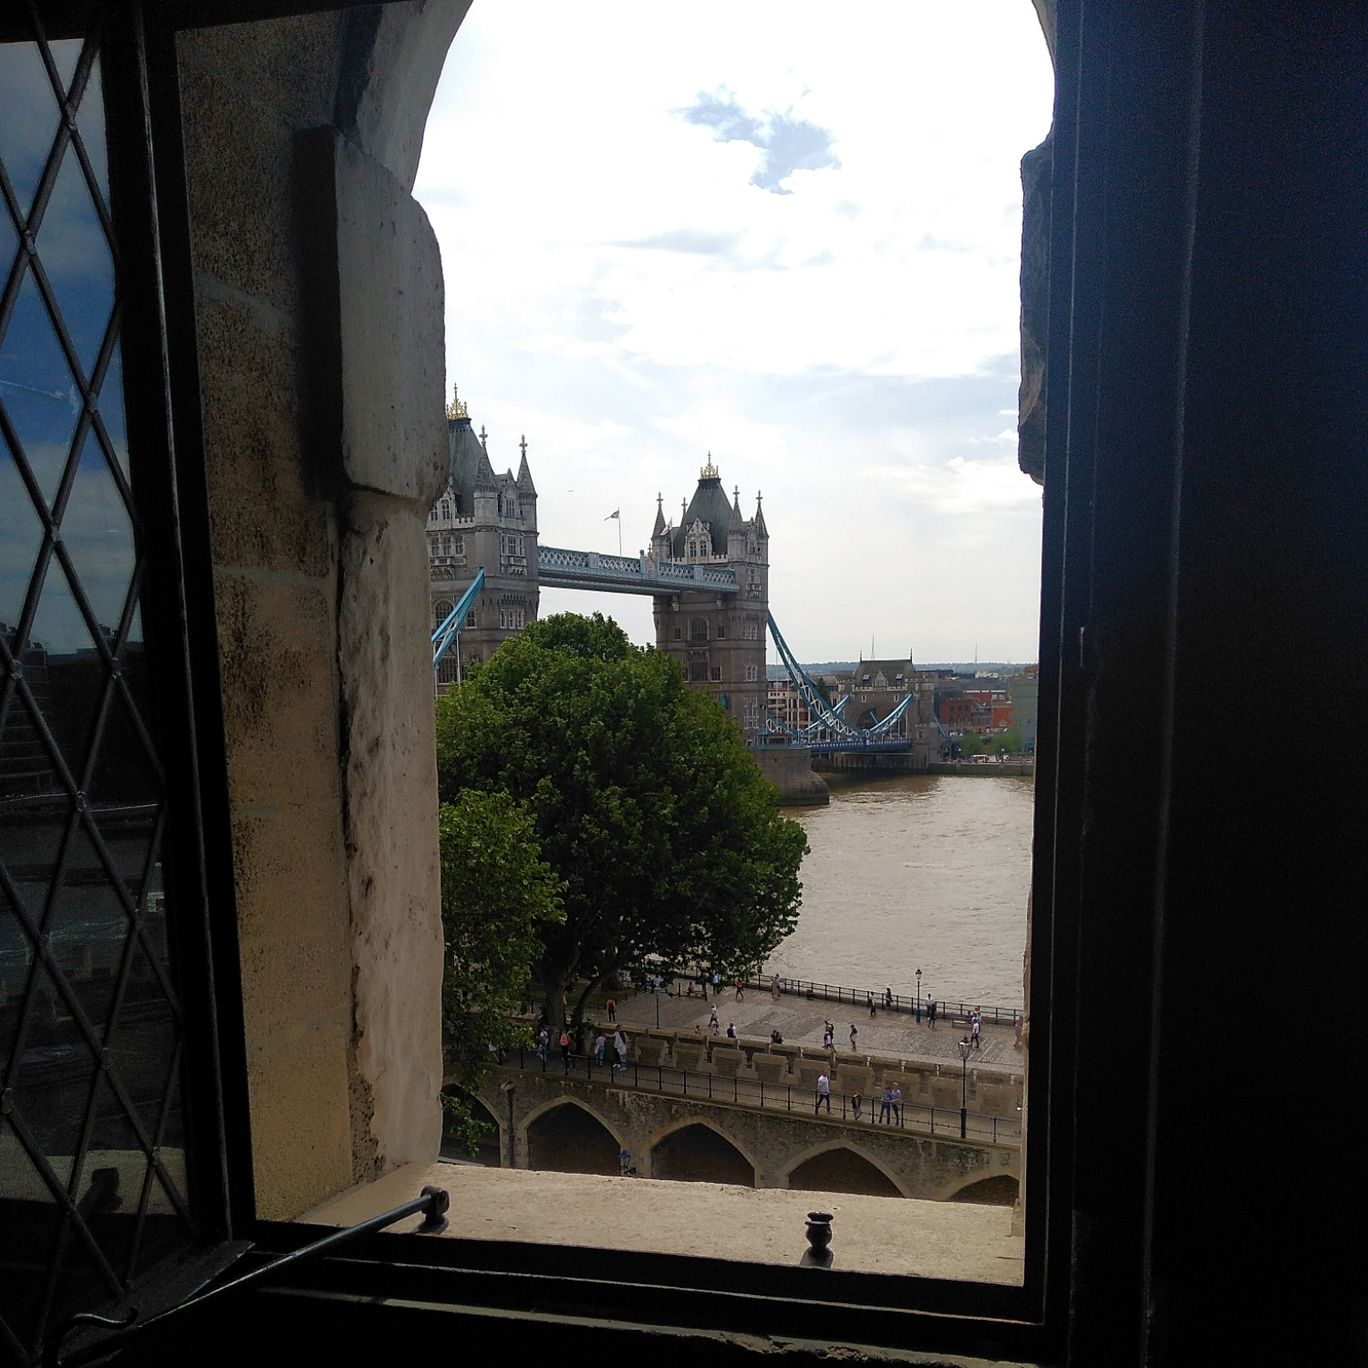 Photo of London Bridge By sunny sachdeva